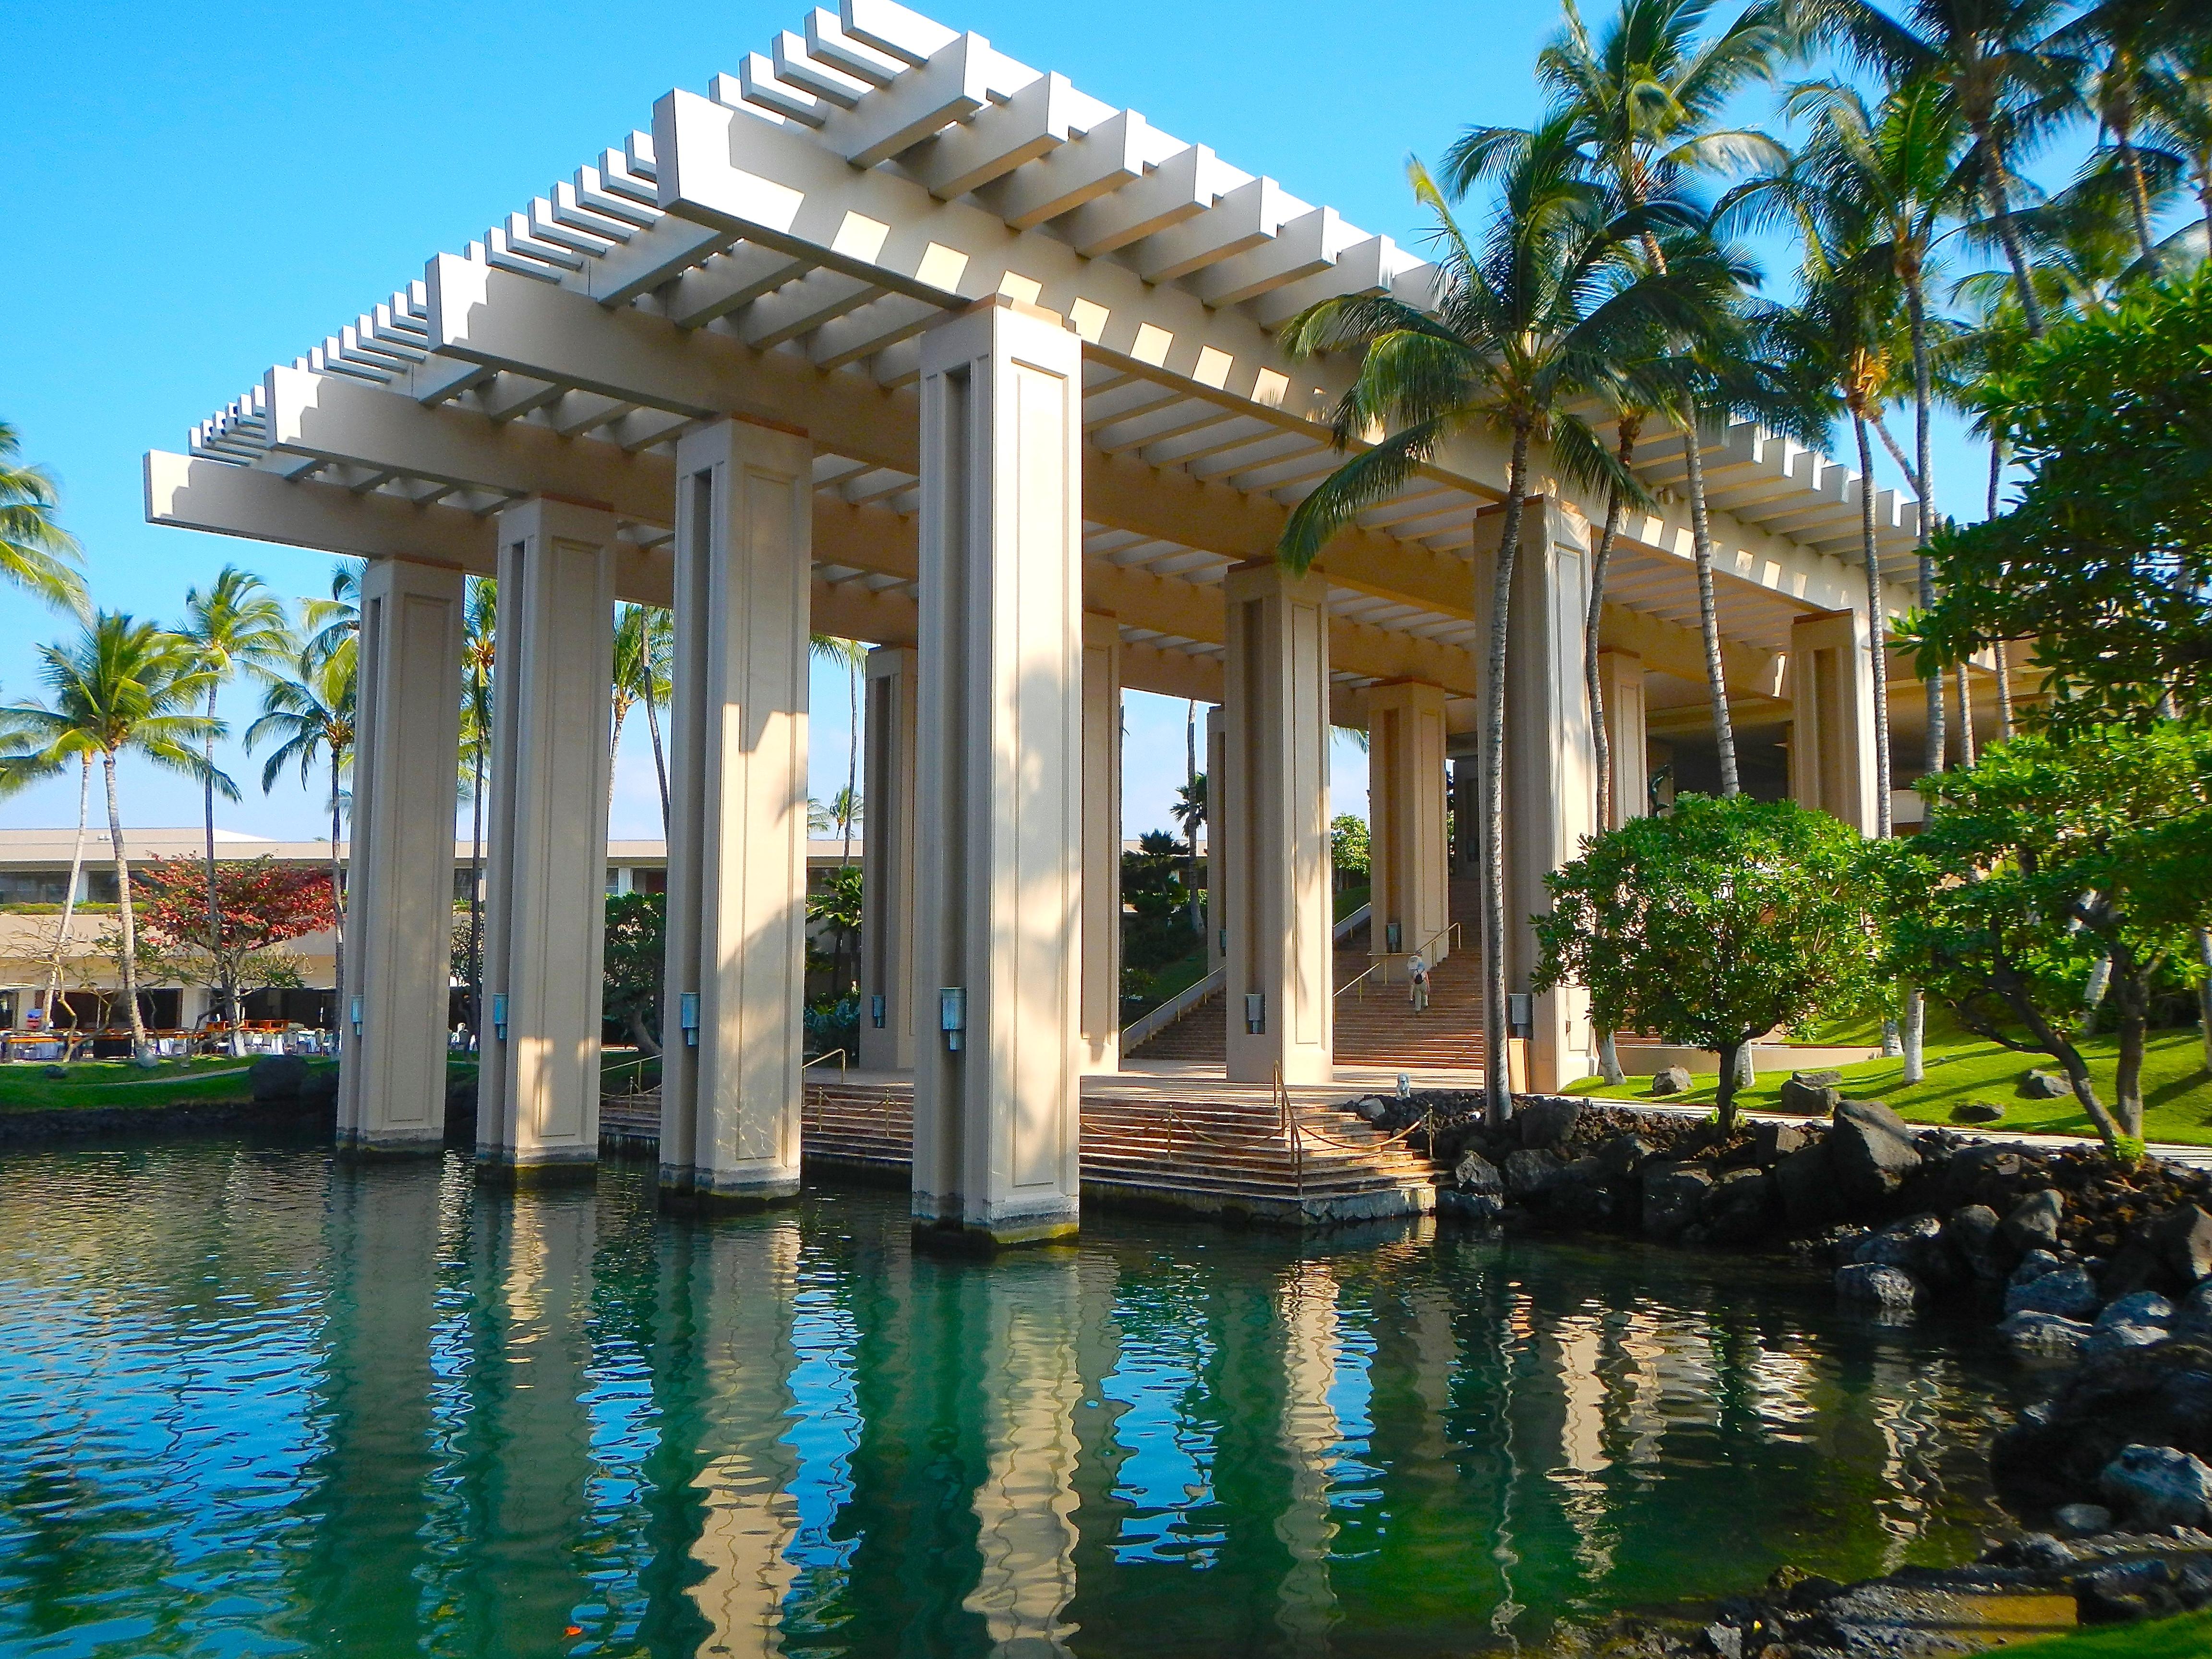 Conference Center at Hilton's Waikola Village Resort